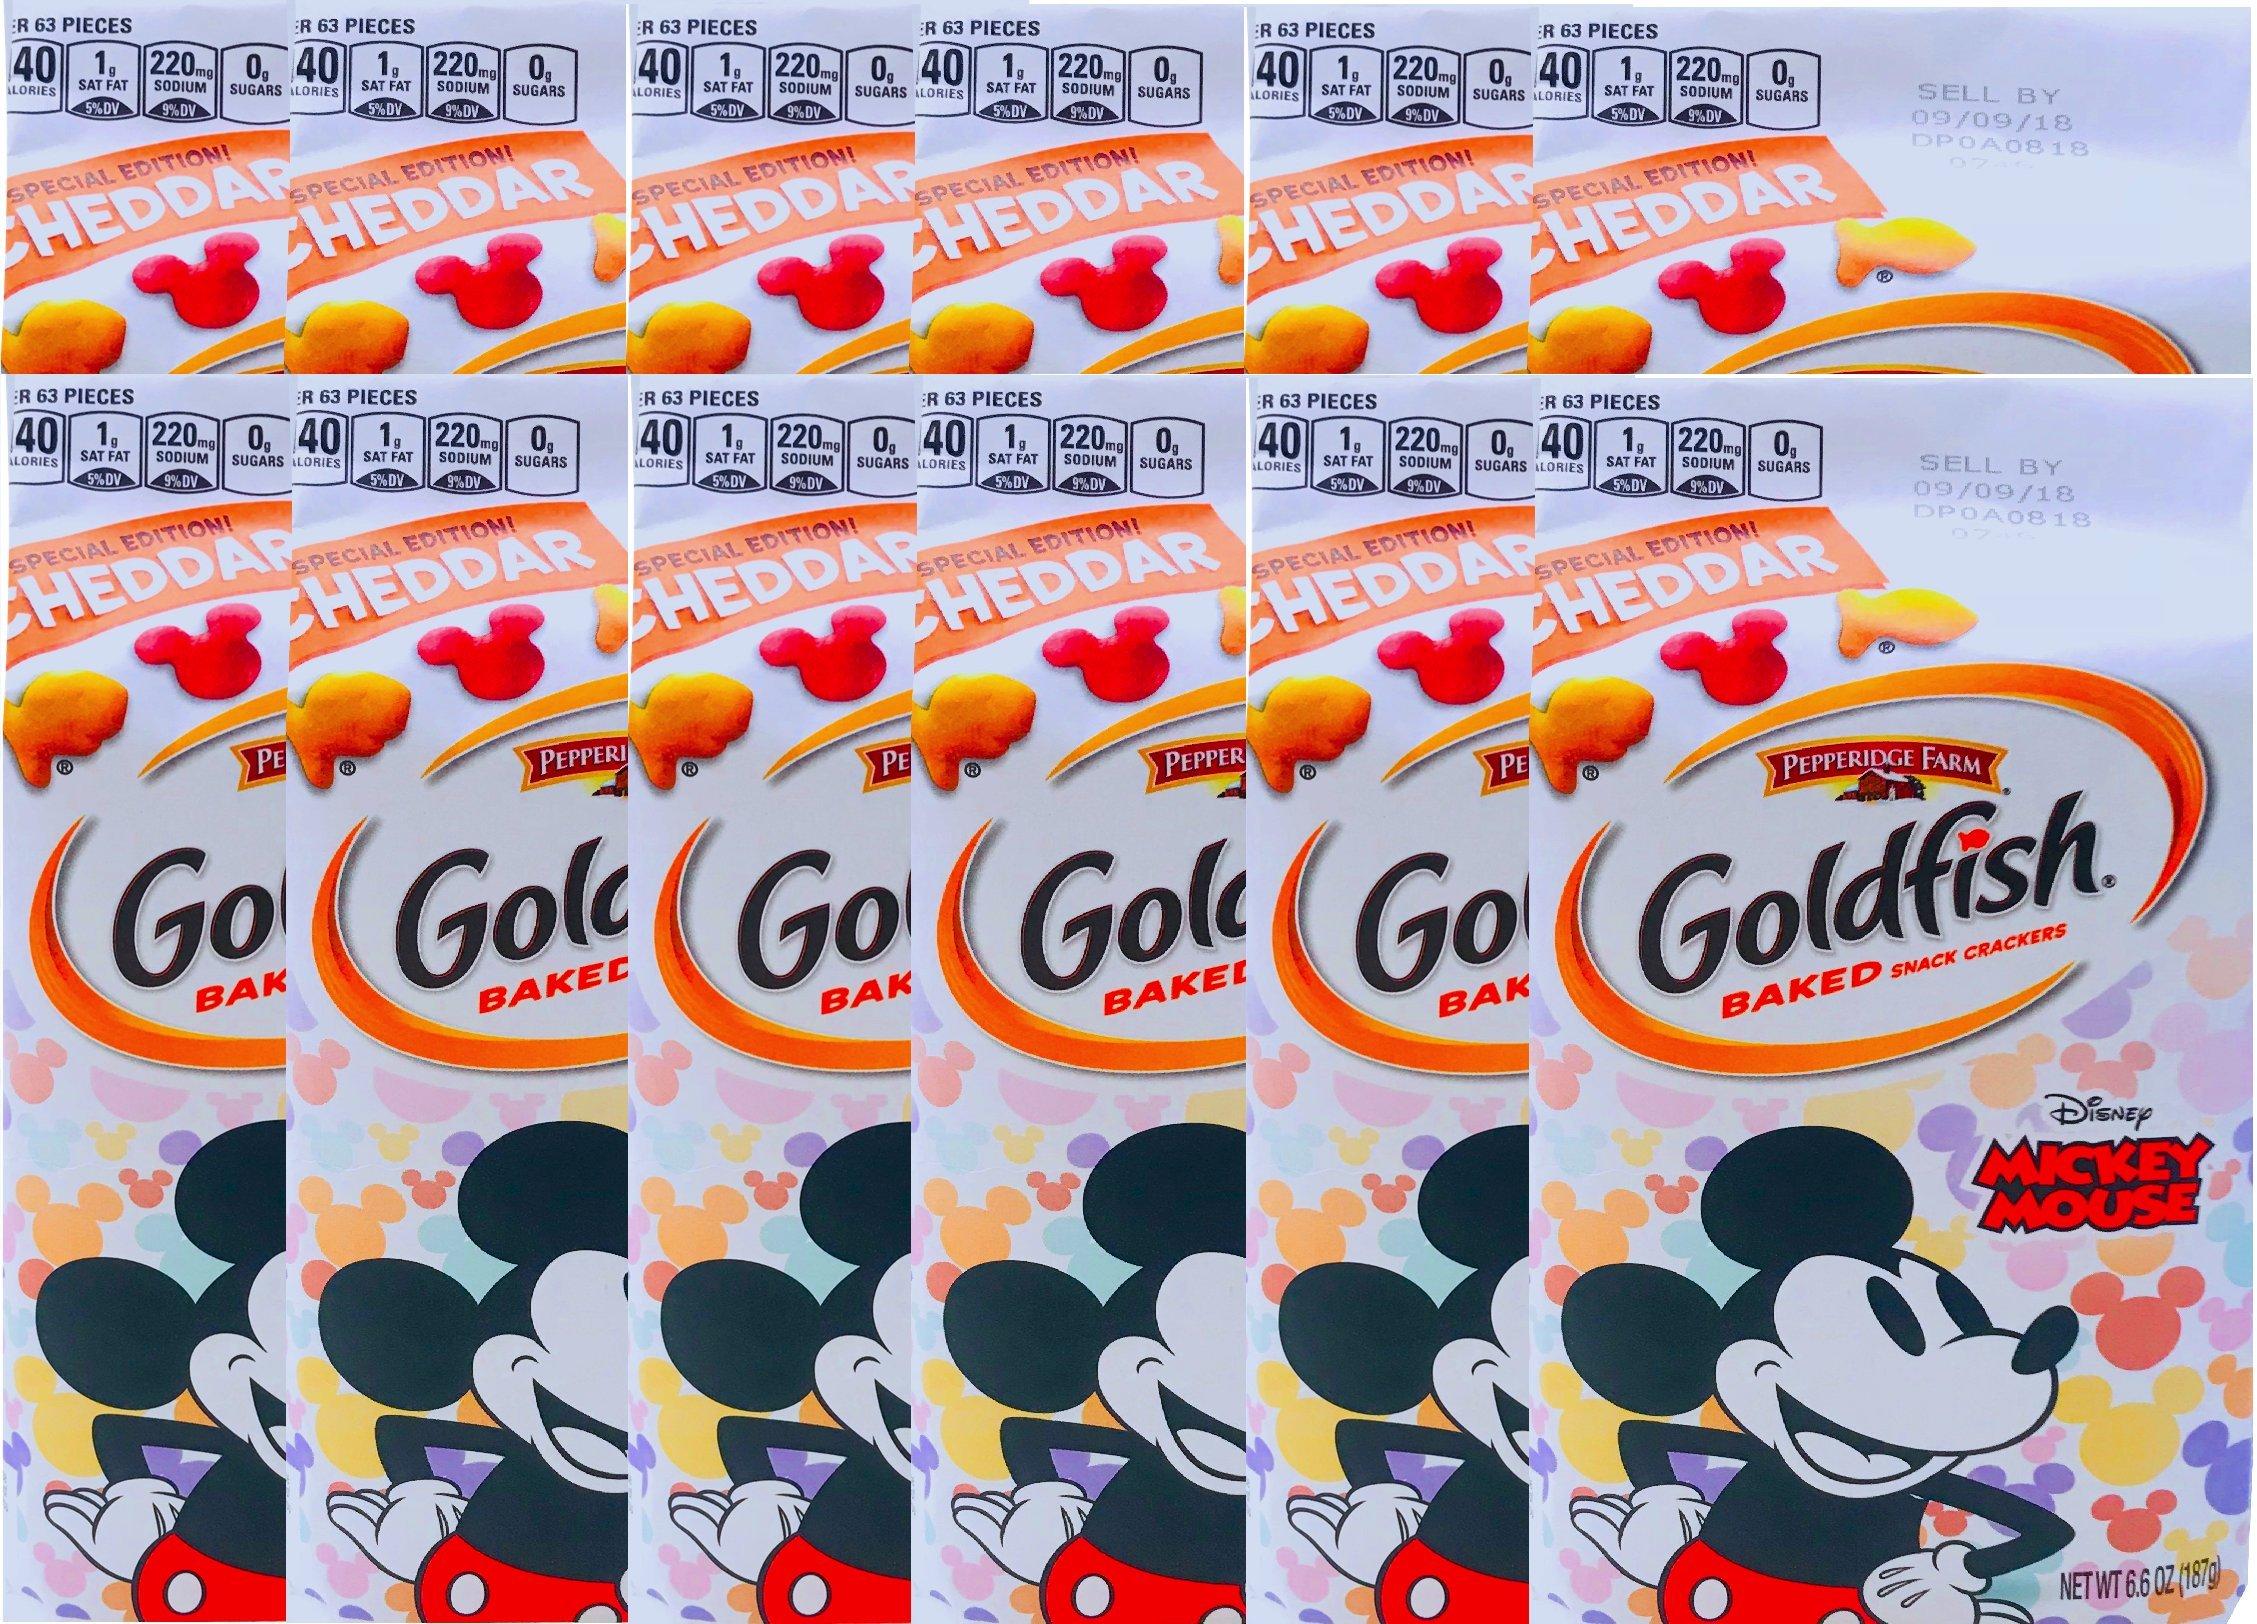 NEW Pepperidge Farm Goldfish Baked Special Edition Cheddar Mickey Mouse Net Wt 6.6 Oz (12) by PepperidgeFarm